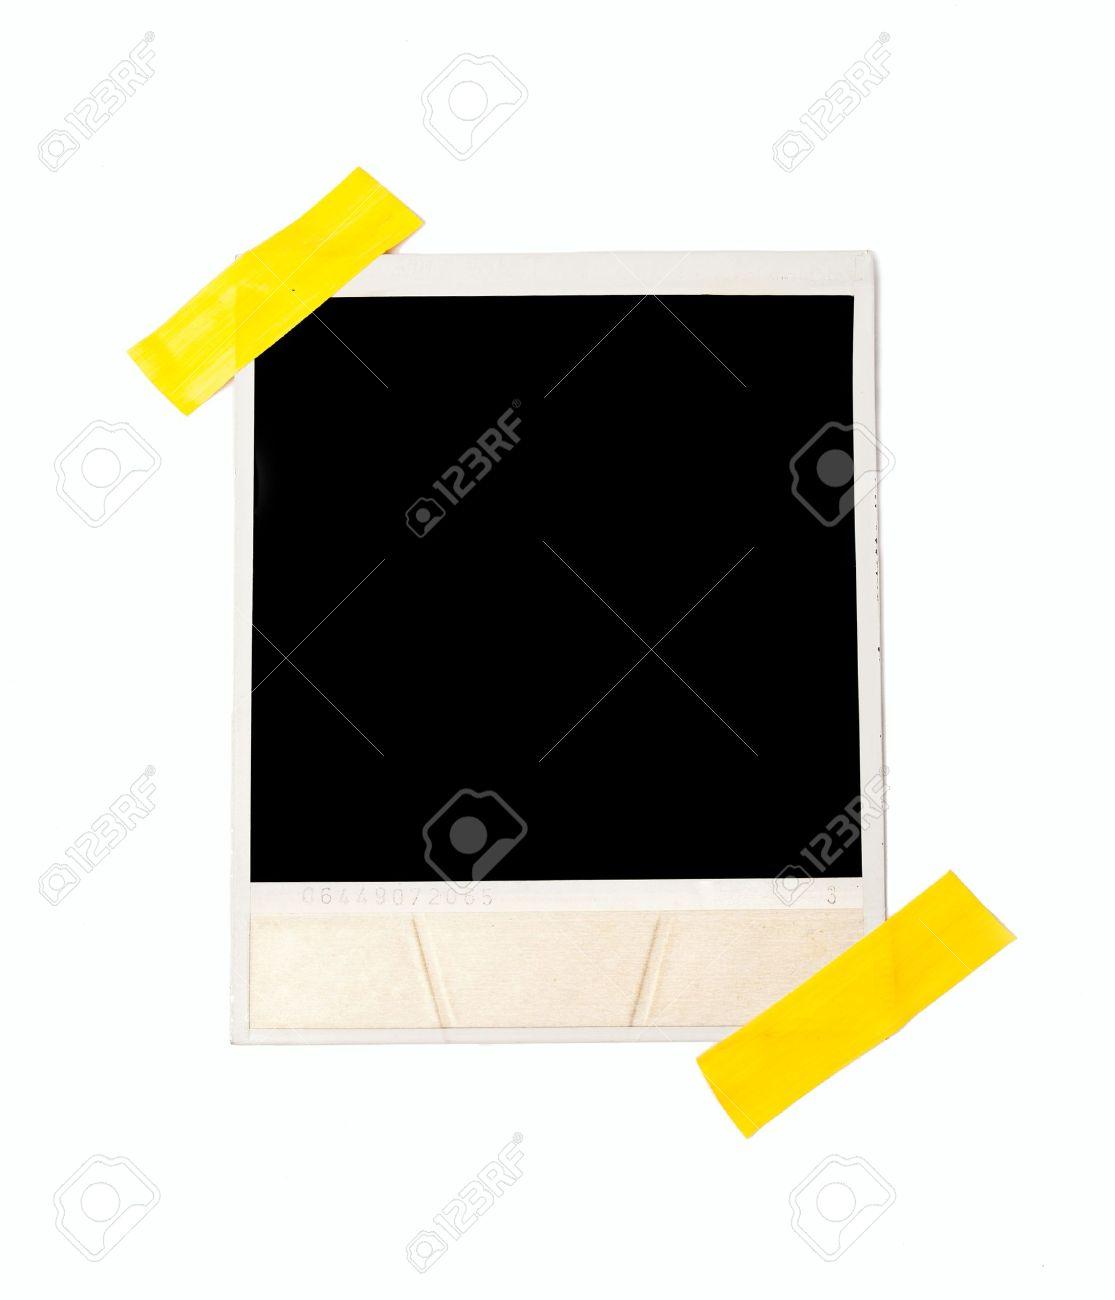 Taped polaroid style photo frame, isolated on white Stock Photo - 19494935